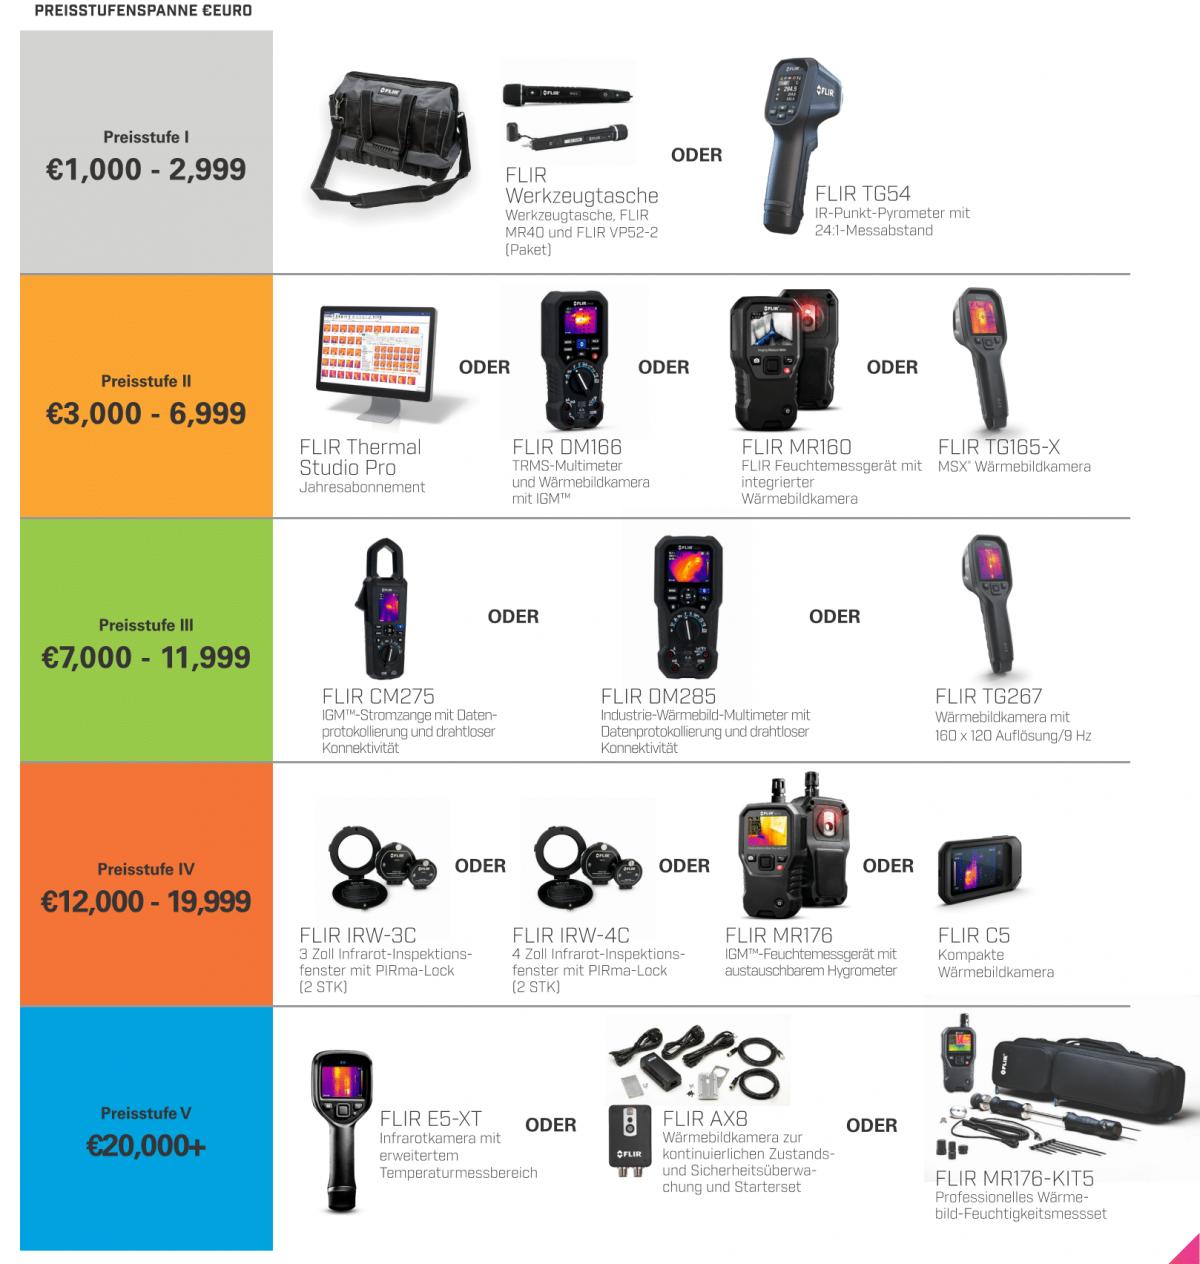 21-0559-ins-rewards-german-eu-euro-a4-v2-final_Page_1